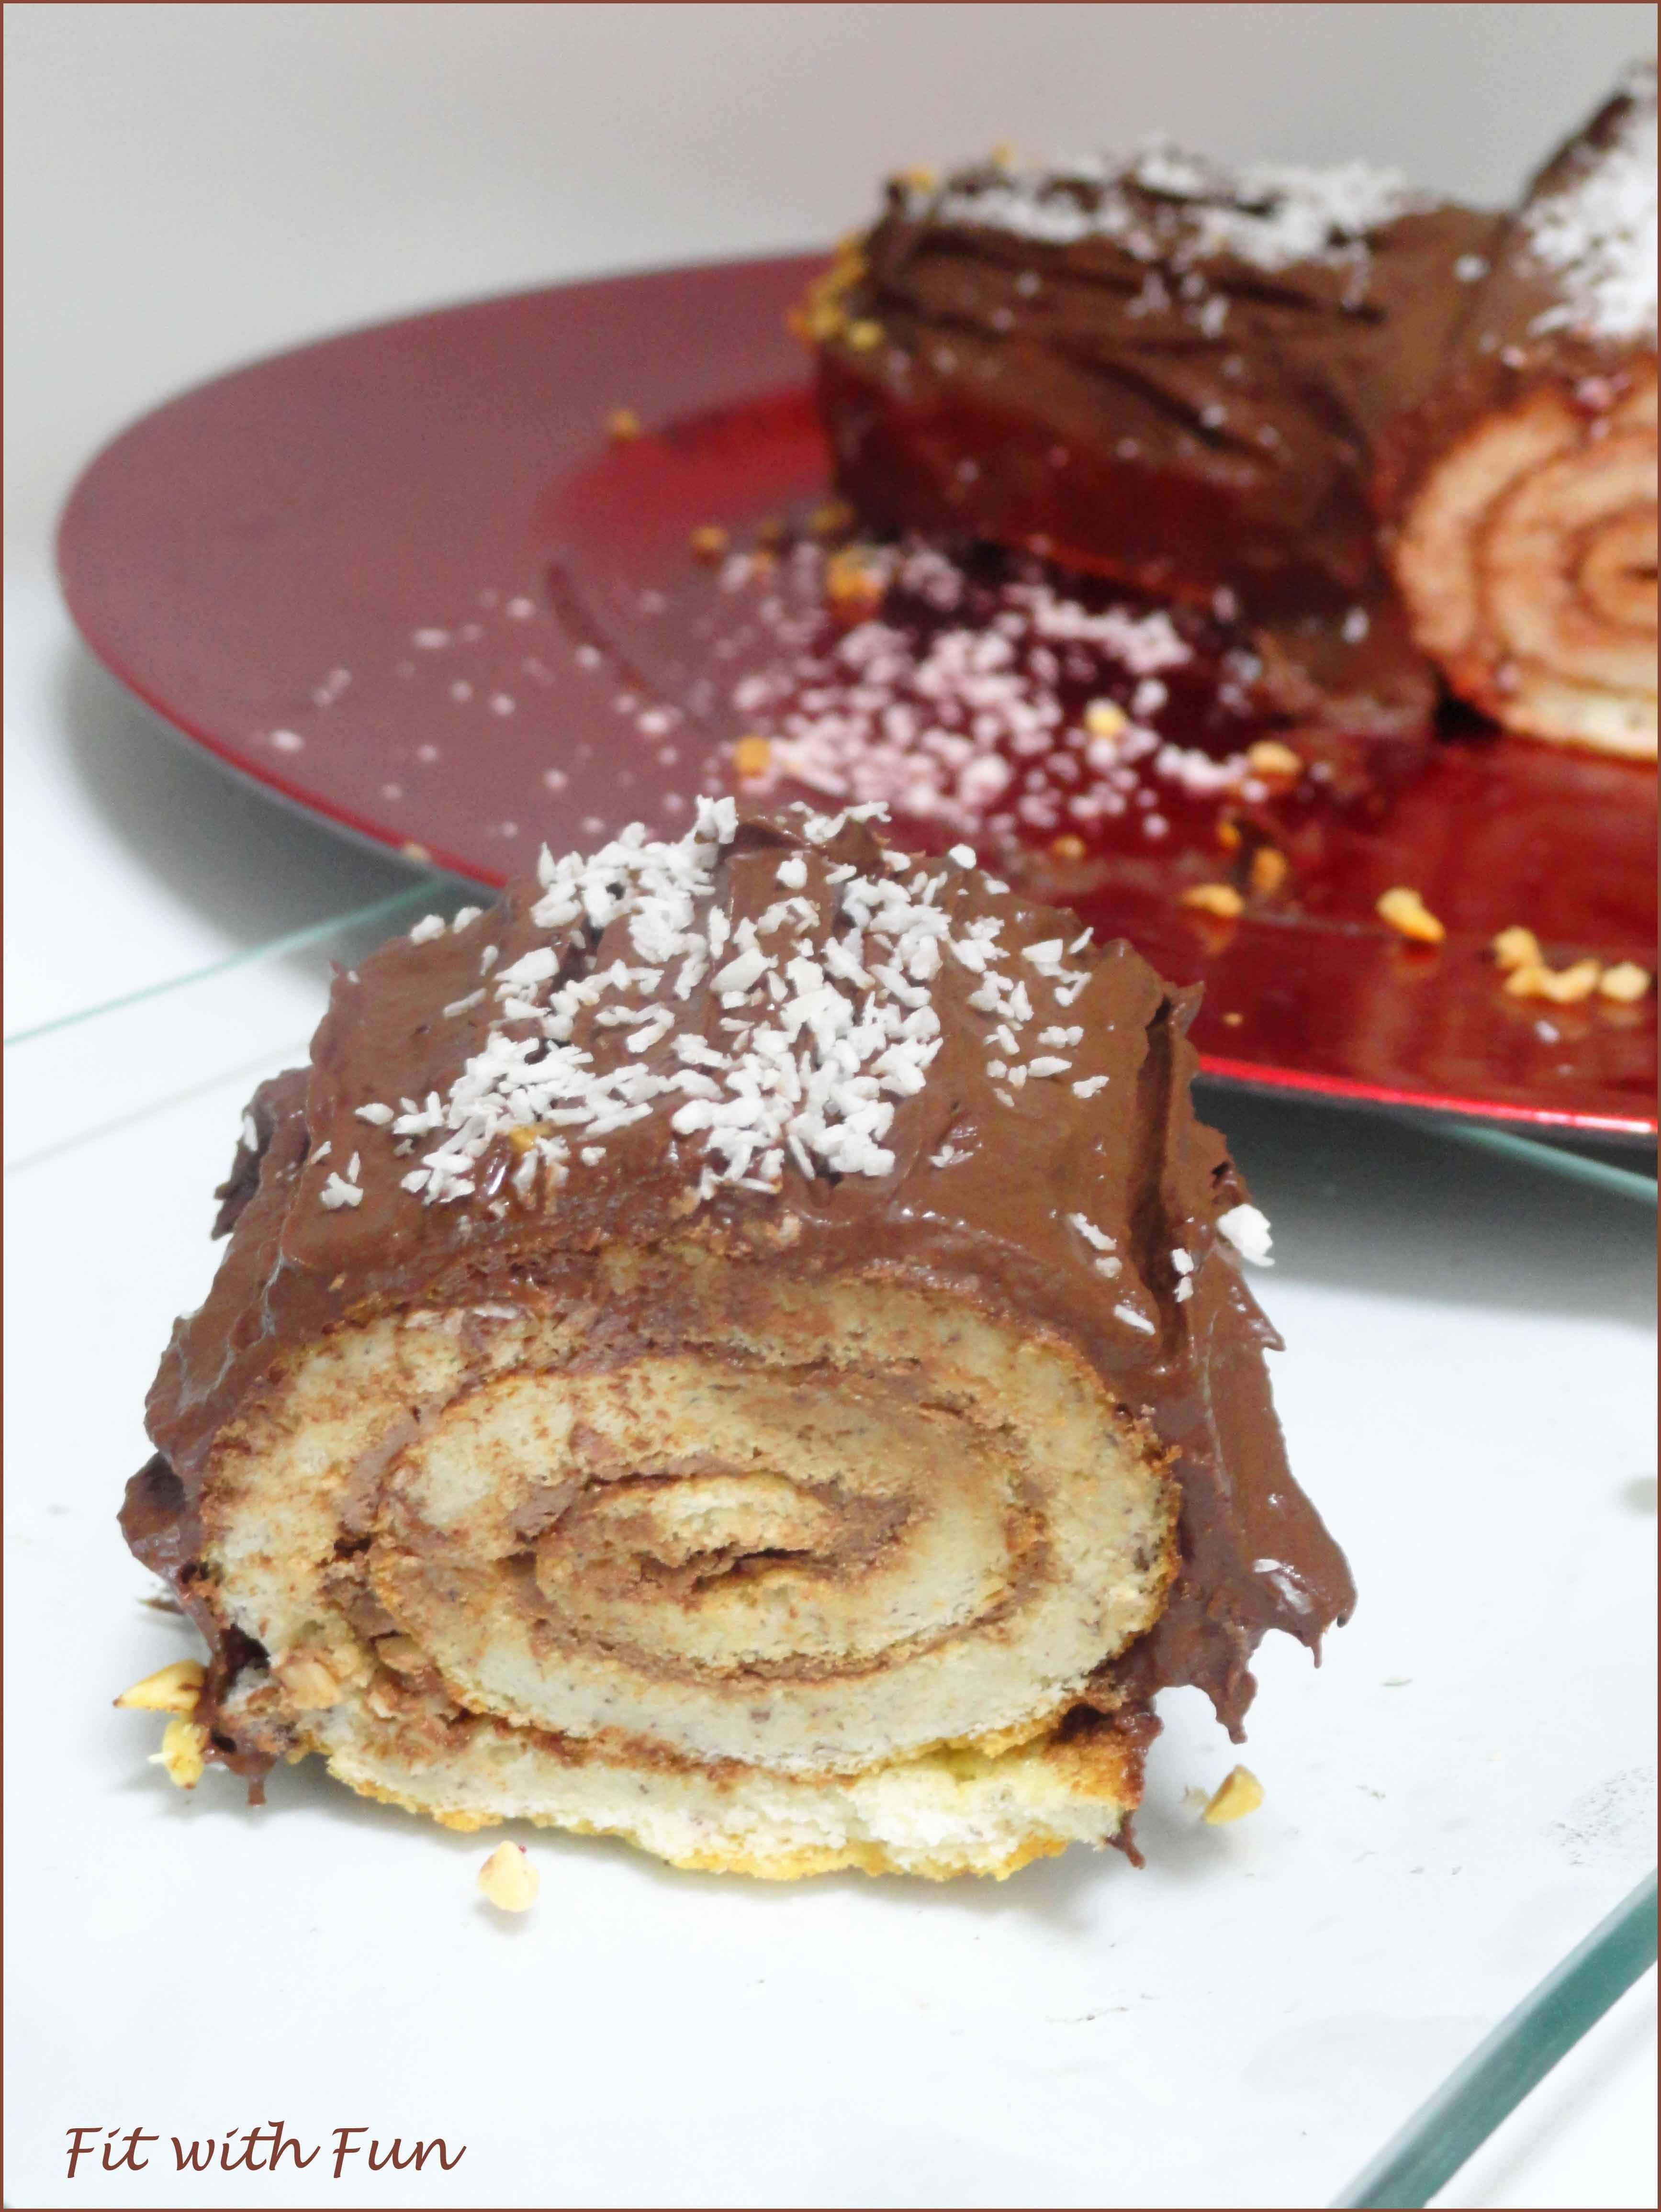 Tronchetto Di Natale Light.The Healthy Gluten Free Chocolate Christmas Log